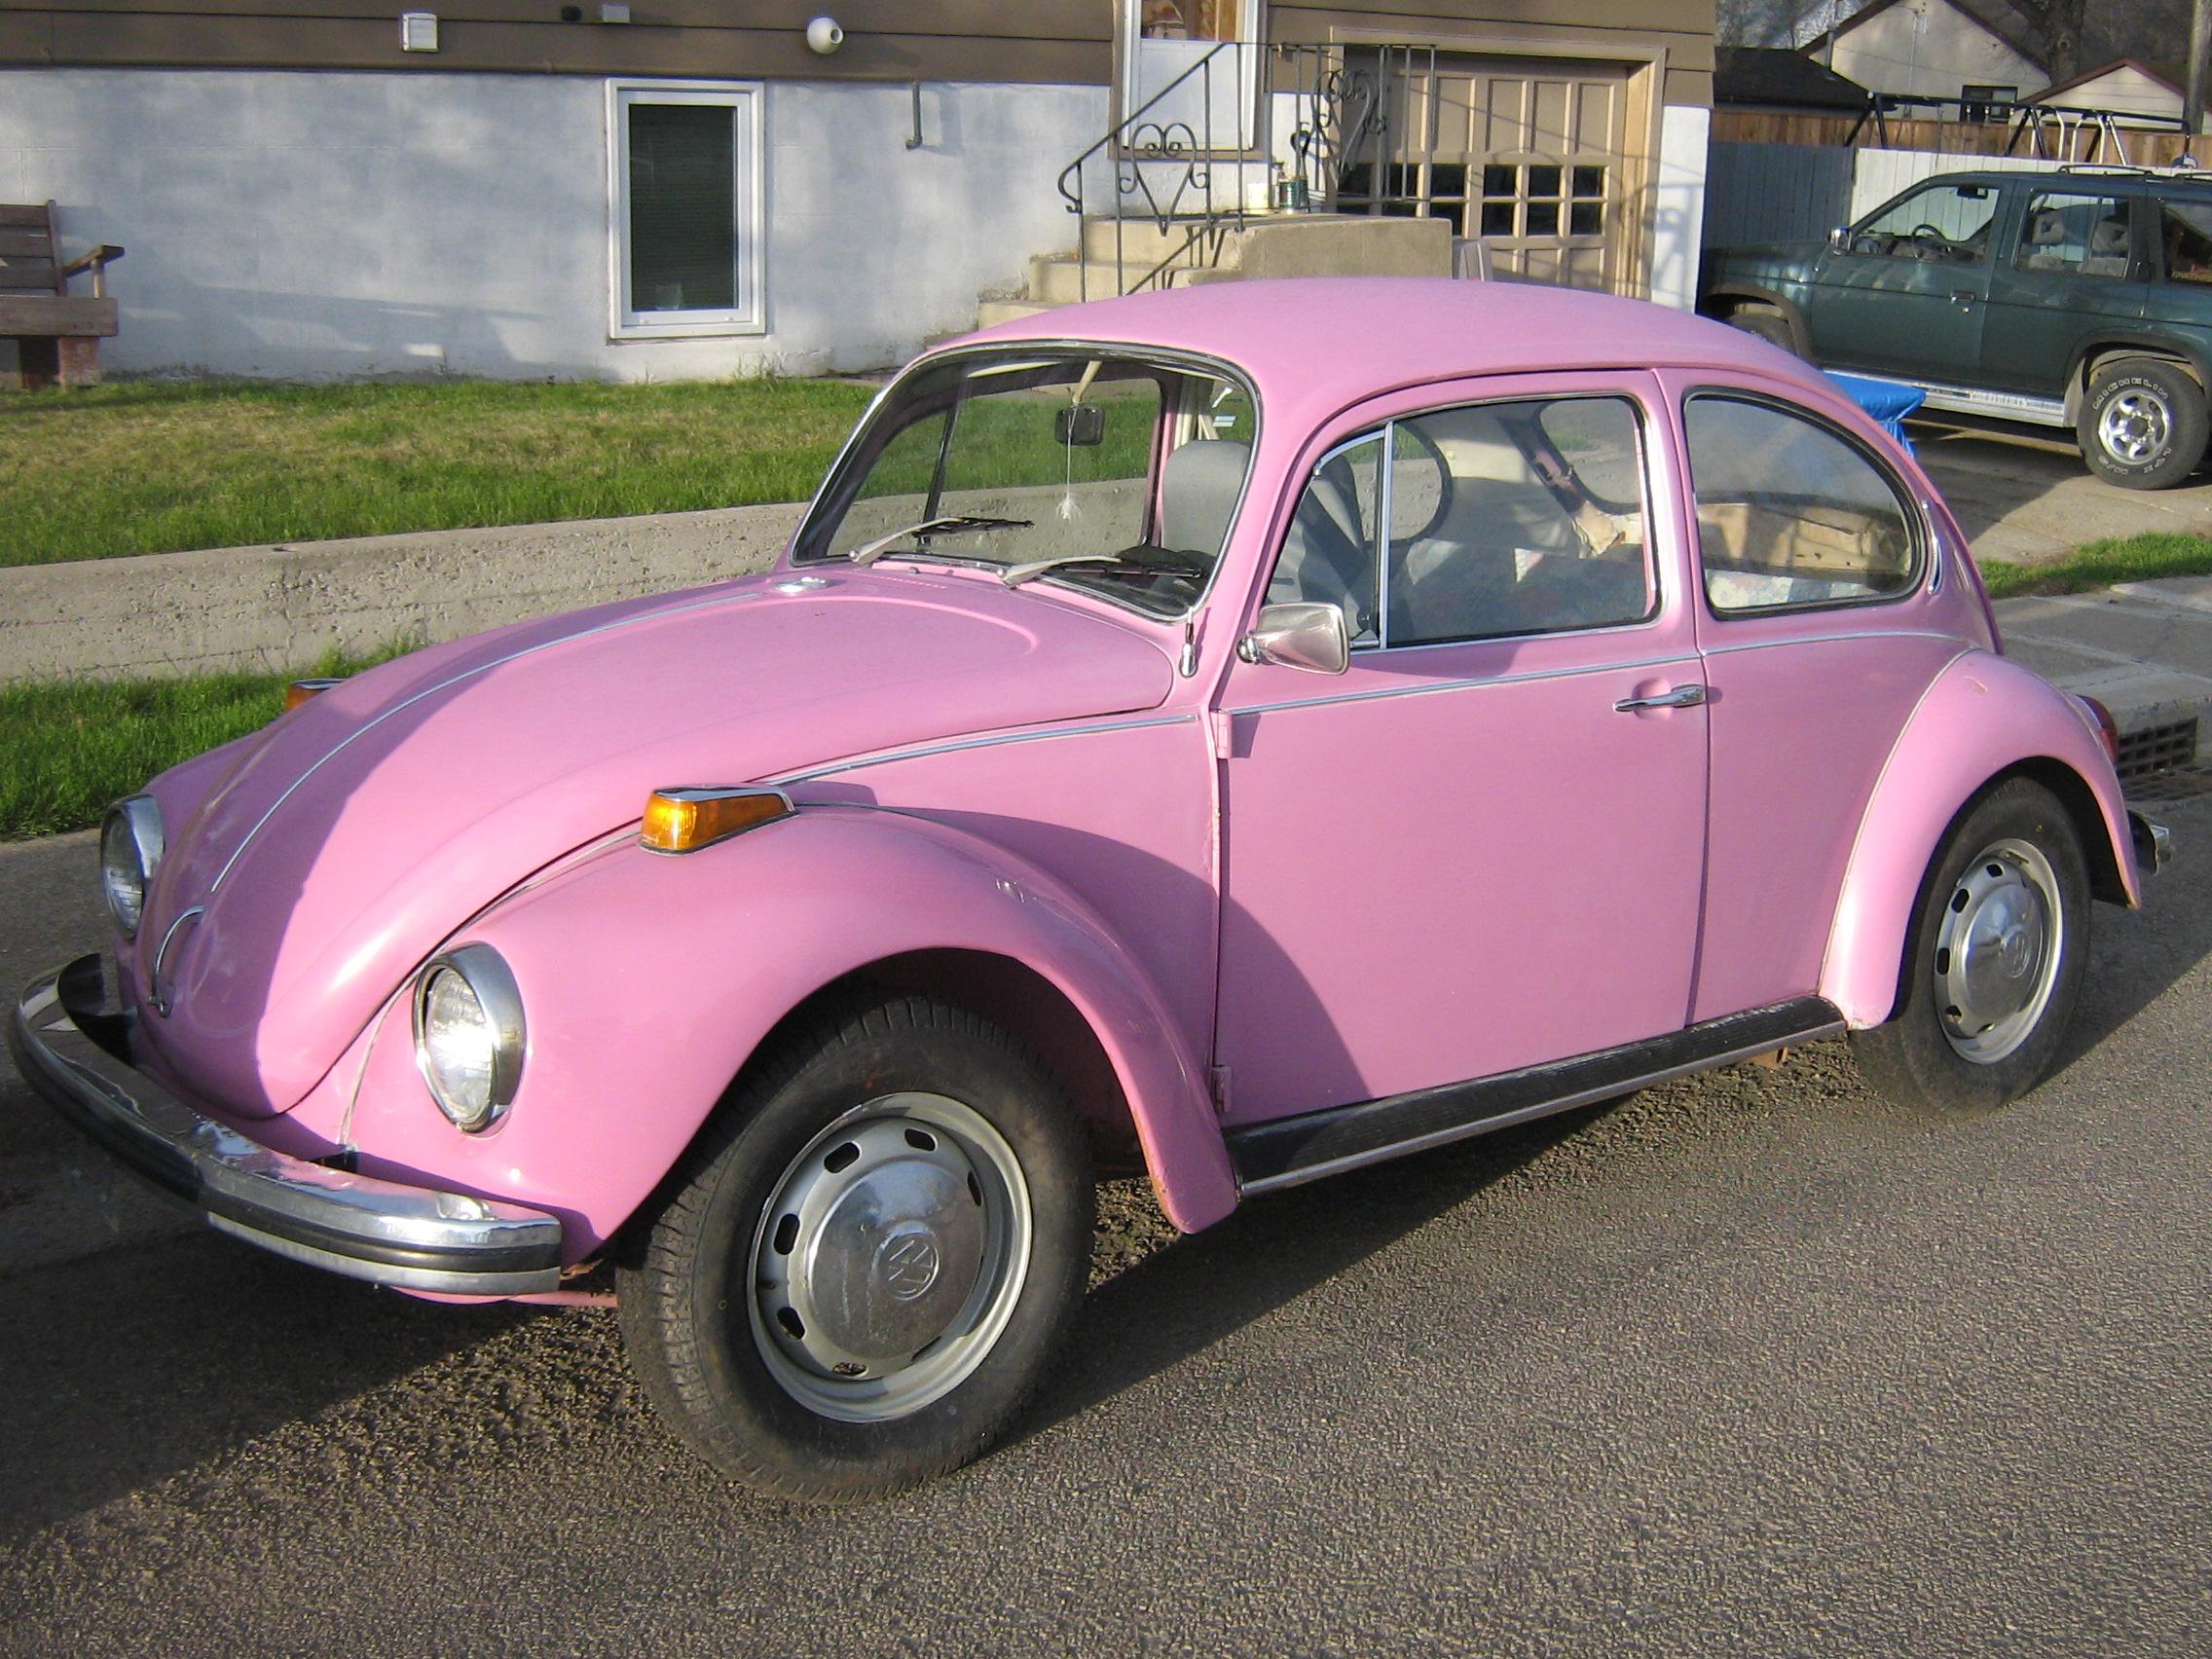 file:pink vw beetle (2490867150) - wikimedia commons